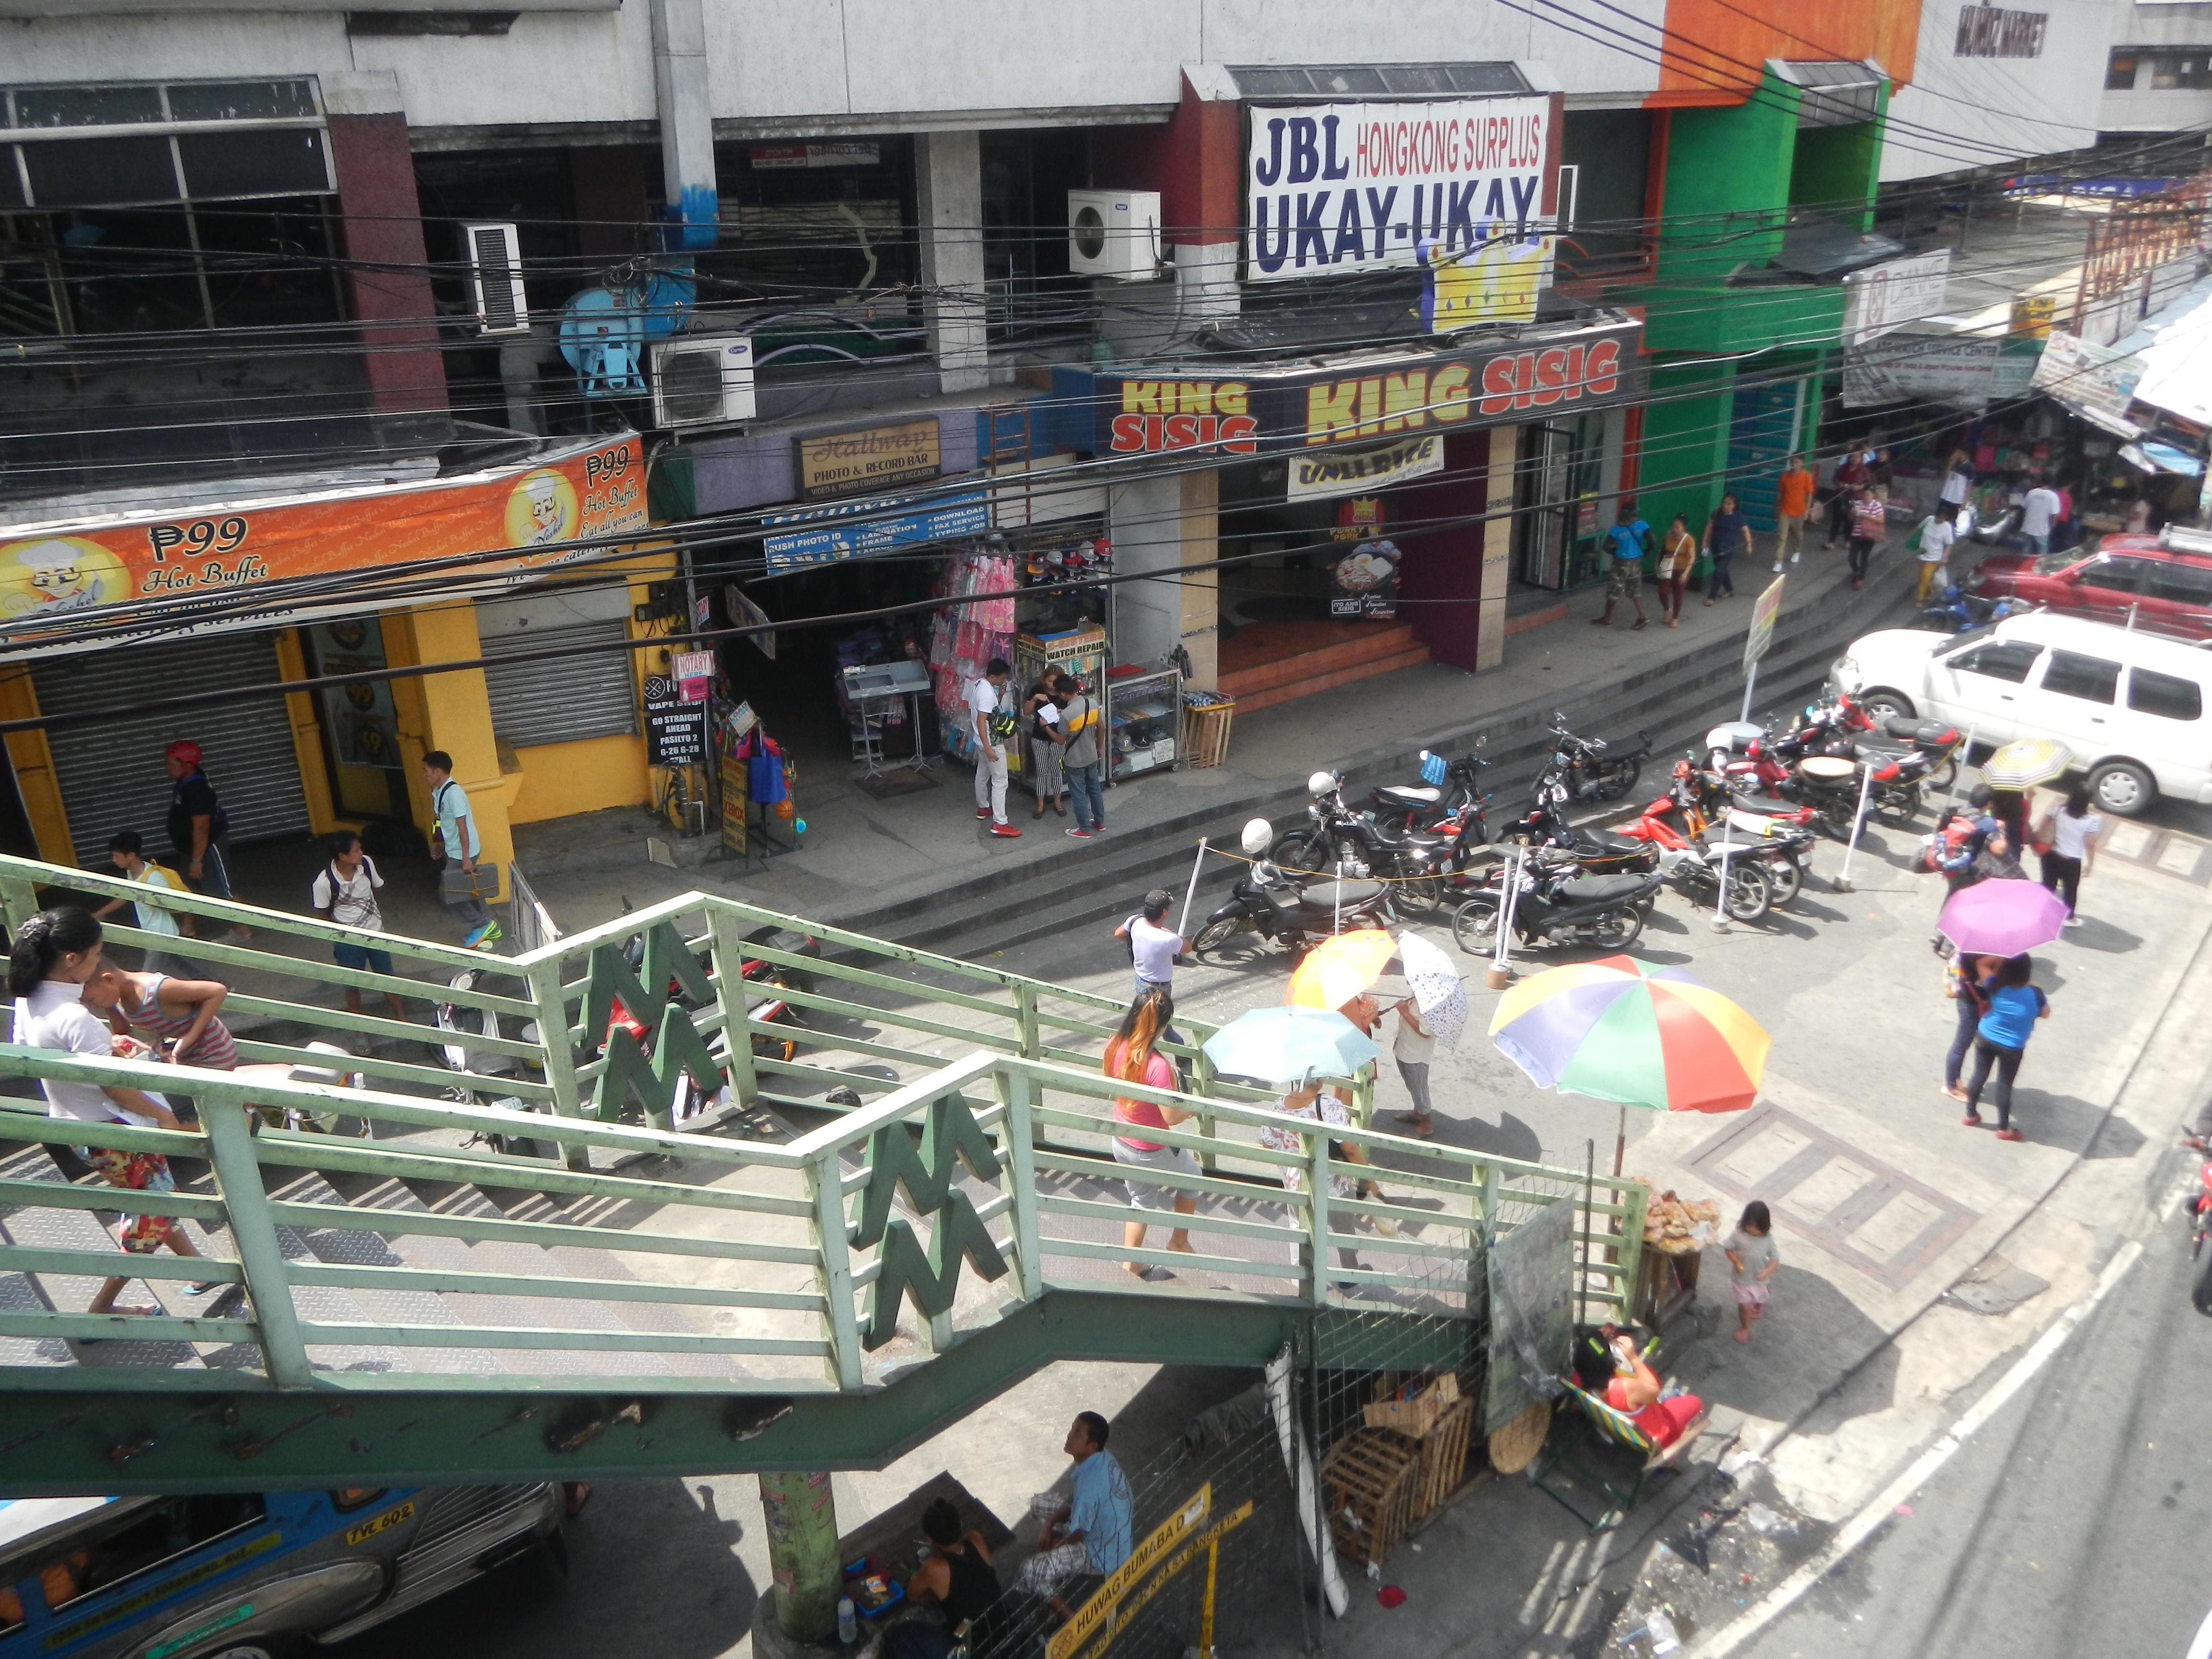 File:08721jfRoosevelt Avenue Barangay Katipunan Muñoz EDSA